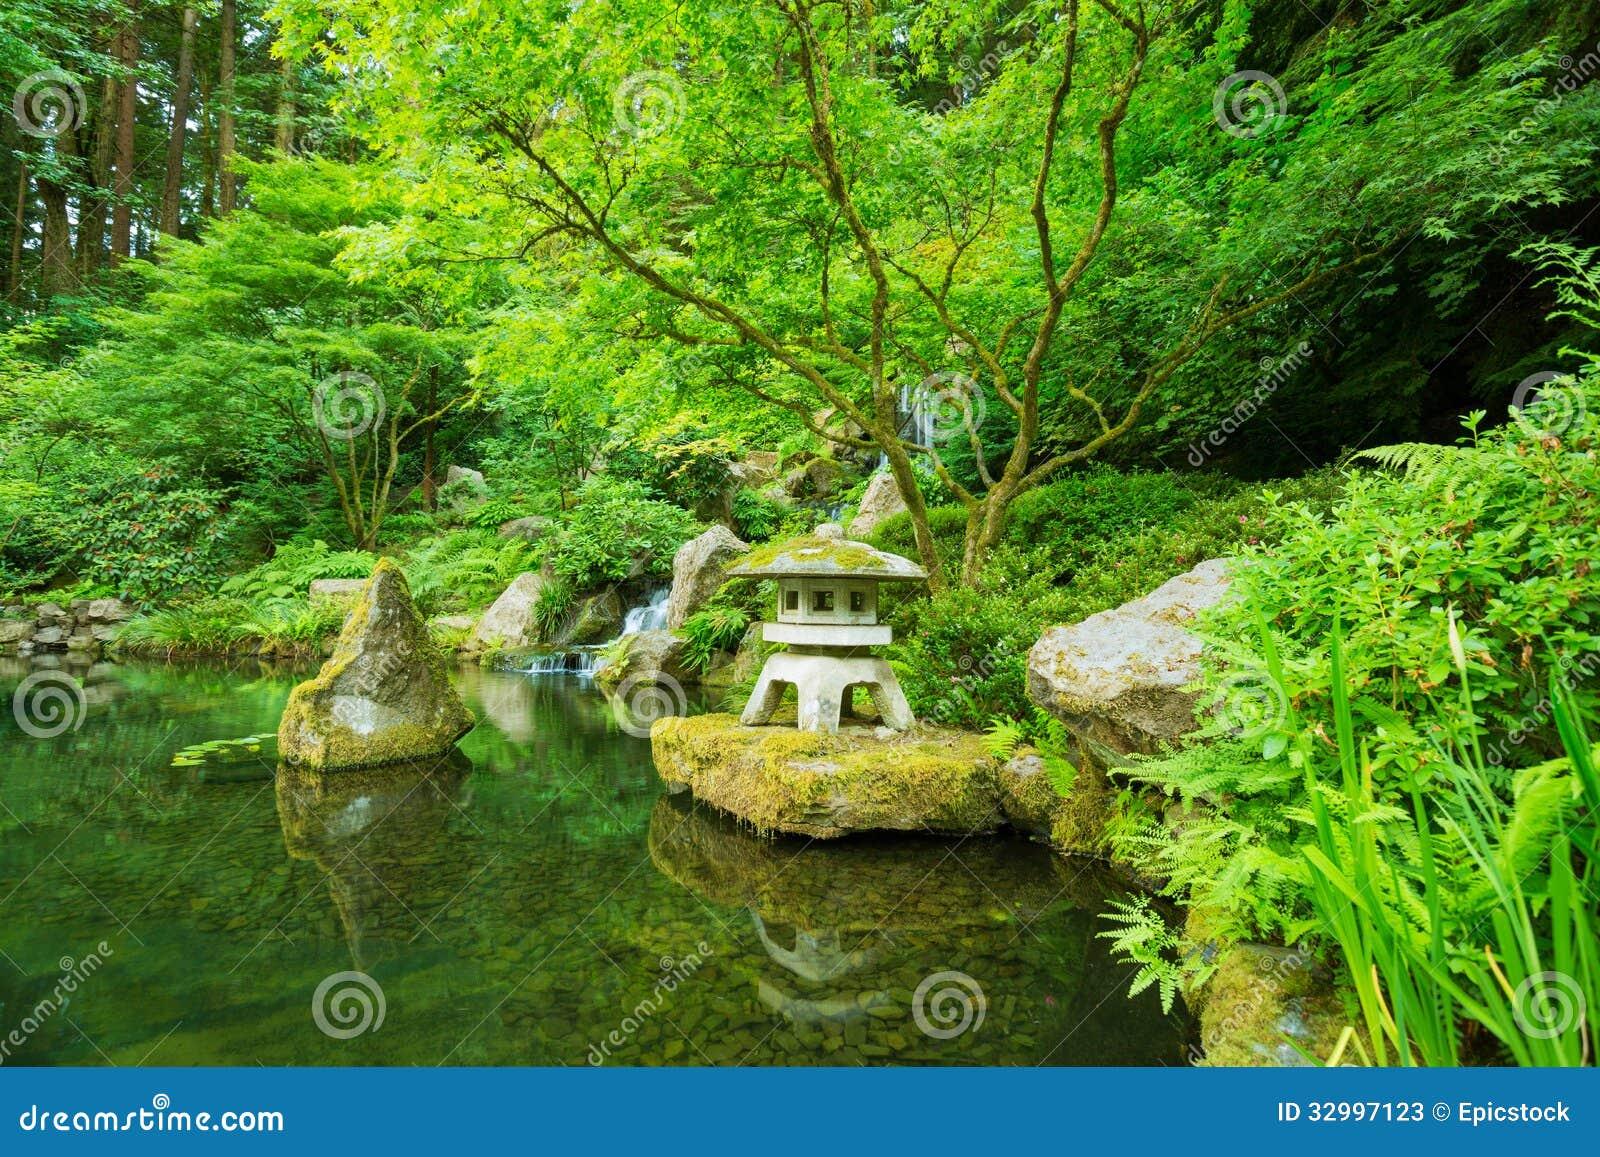 astonishing beautiful zen garden | Beautiful Japanese Garden Stock Photos - Image: 32997123